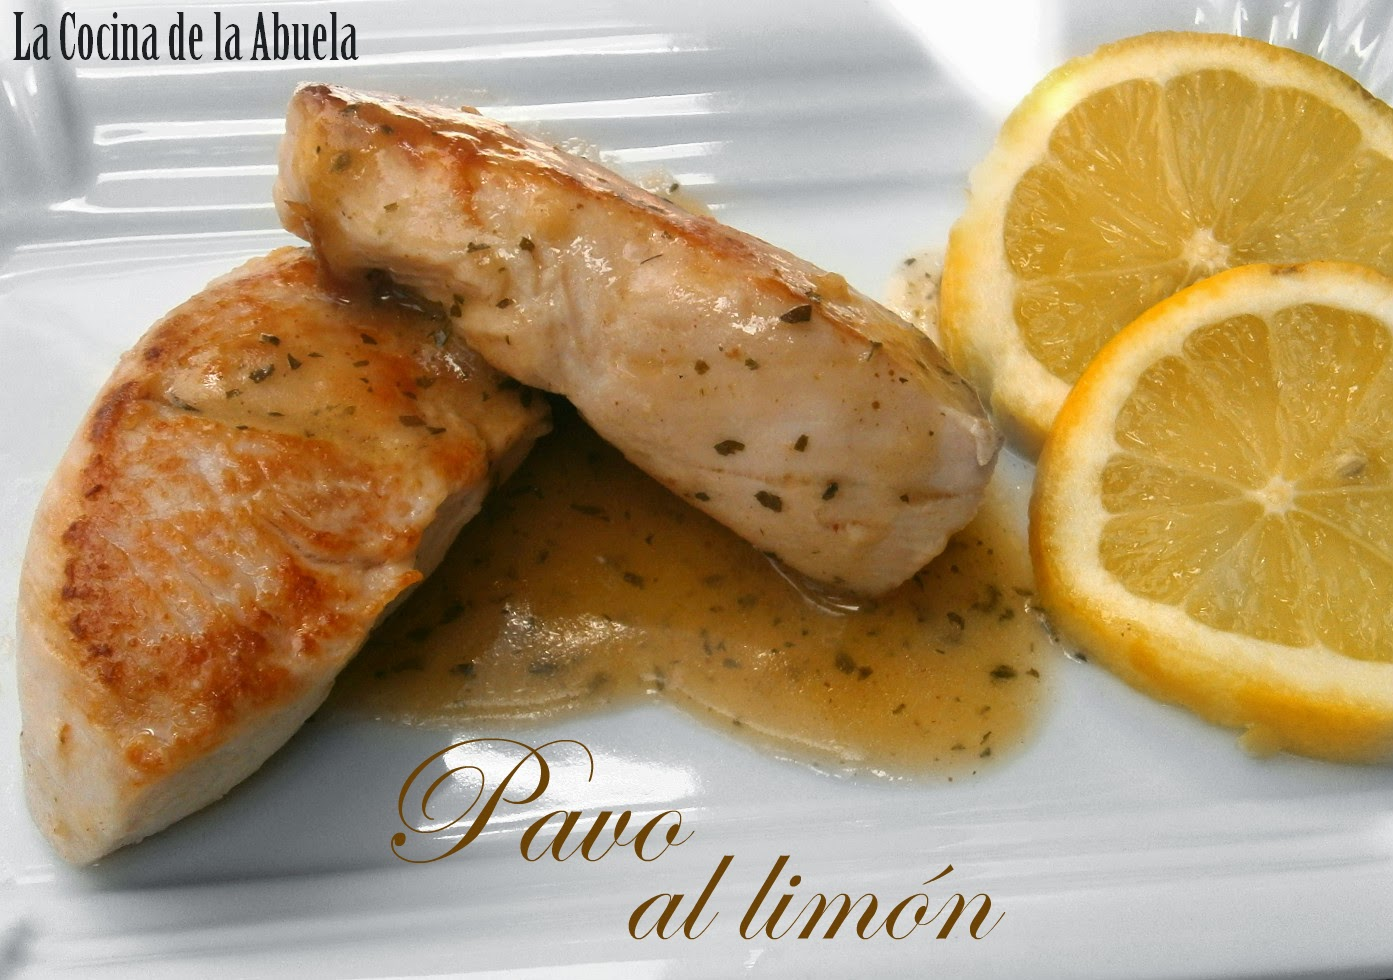 Como Cocinar Pavo | Pechuga De Pavo Al Limon La Cocina De La Abuela